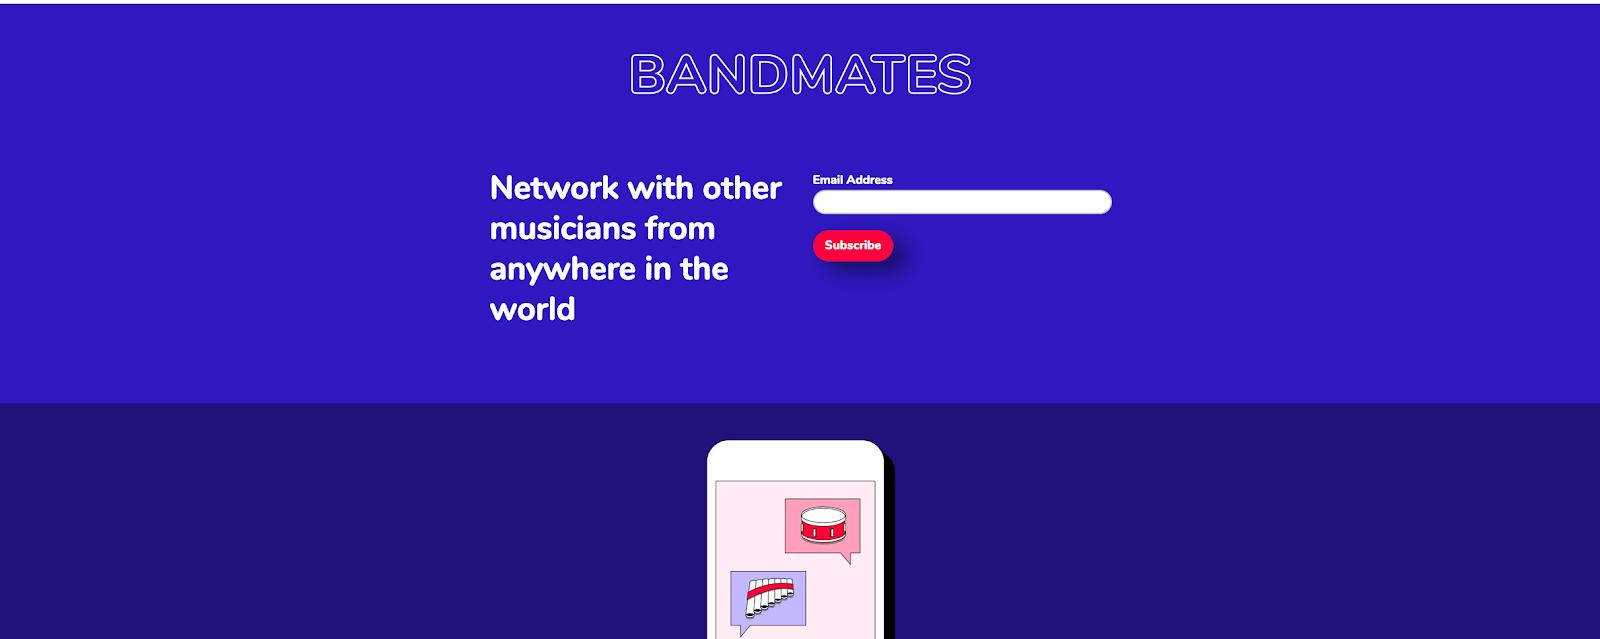 "Bandmates Landing Page from Mailchimp ""width ="" 598 ""style ="" width: 598px; blocco di visualizzazione; margine: 0px auto;"